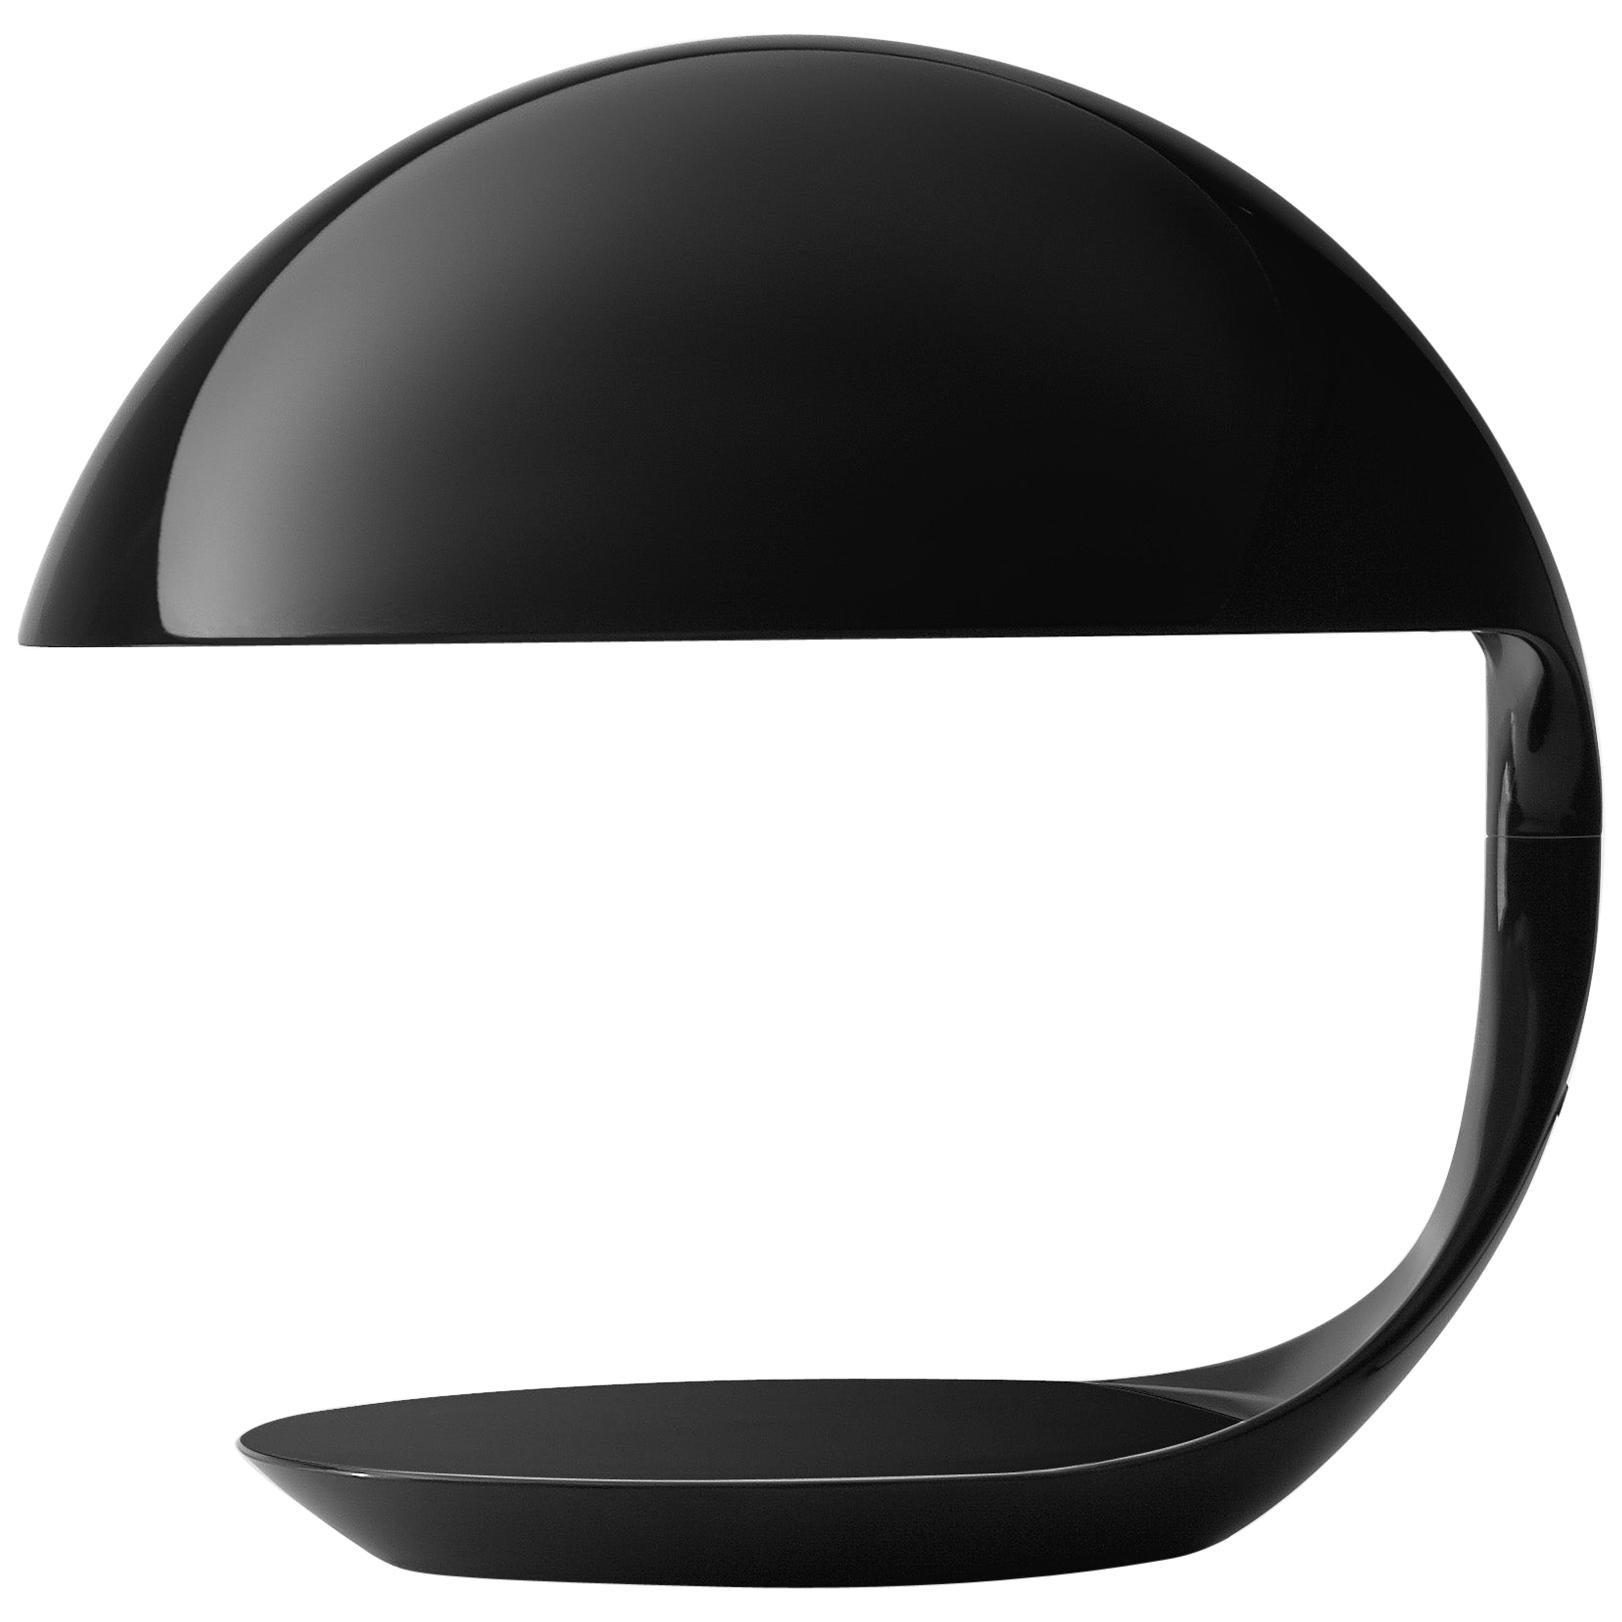 Martinelli Luce Cobra 629 Table Lamp by Elio Martinelli